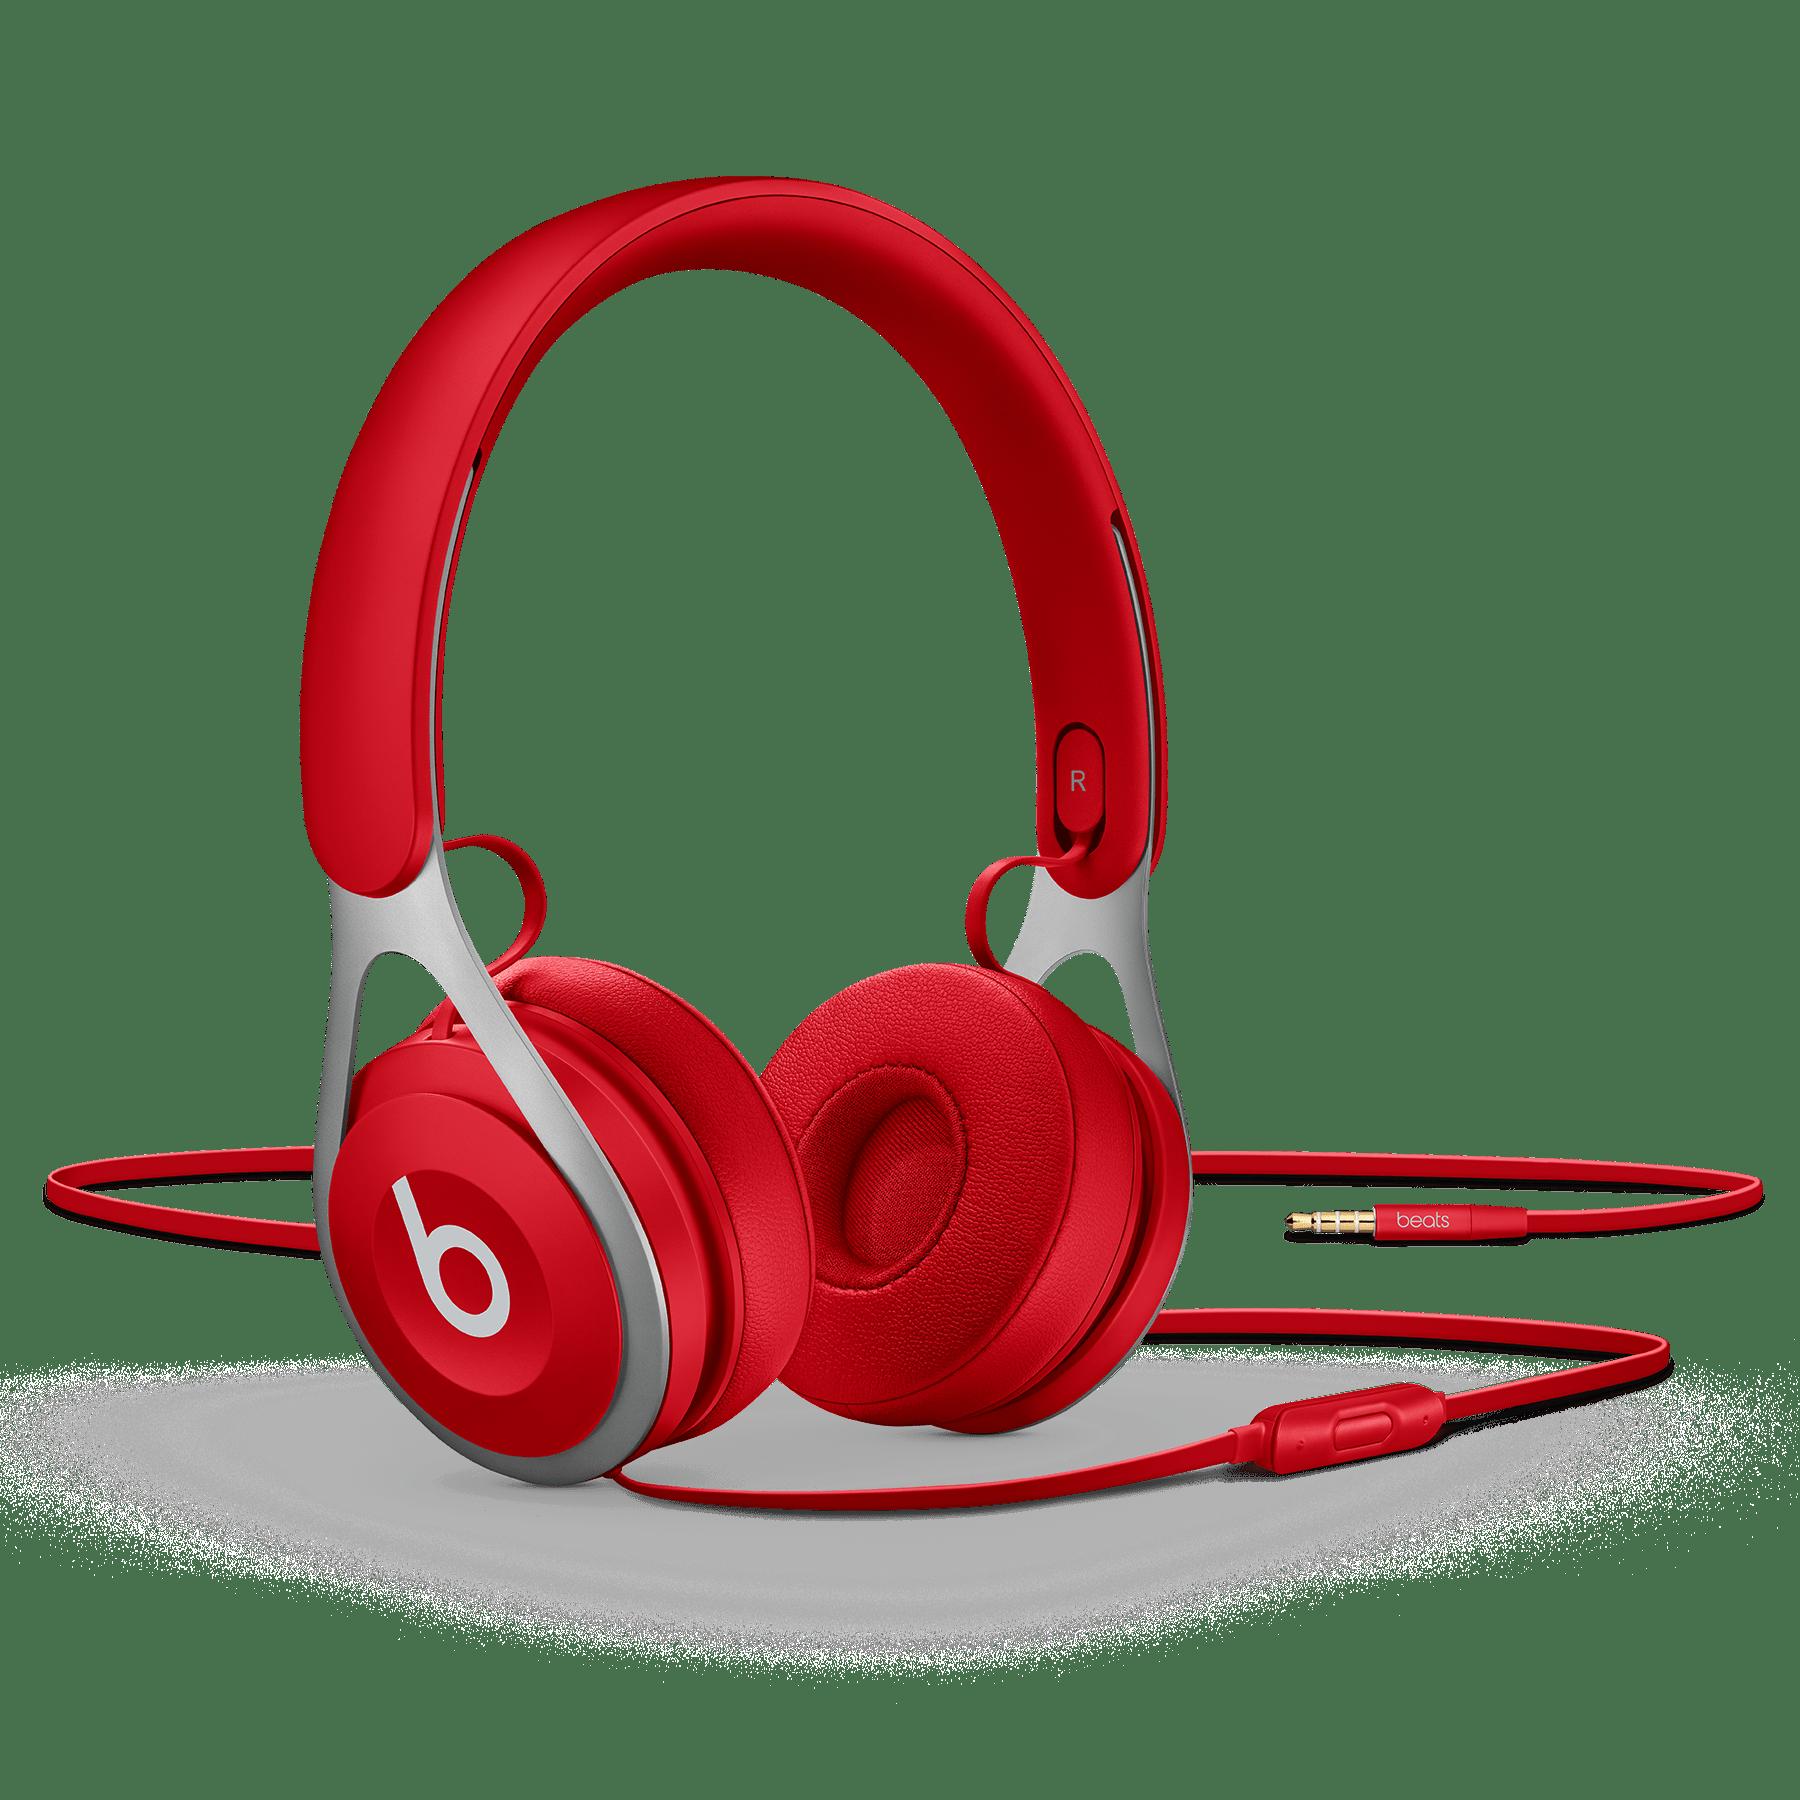 Headphone red headphone